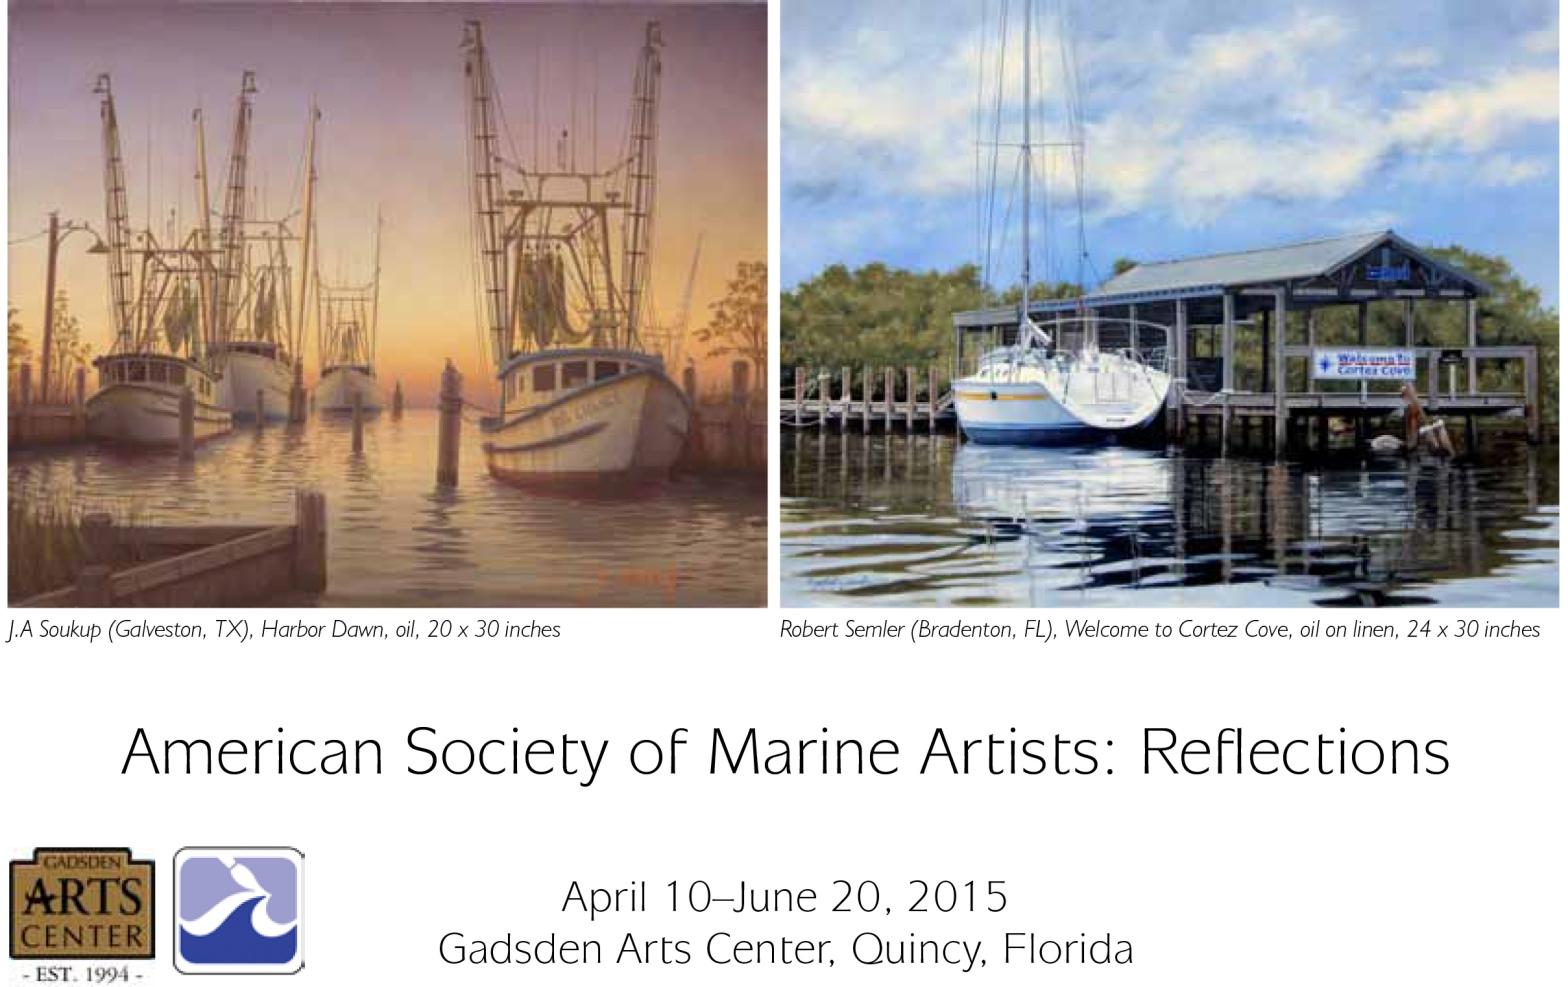 ASMA, American Society of Marine Artists, seascape, marine art, painting